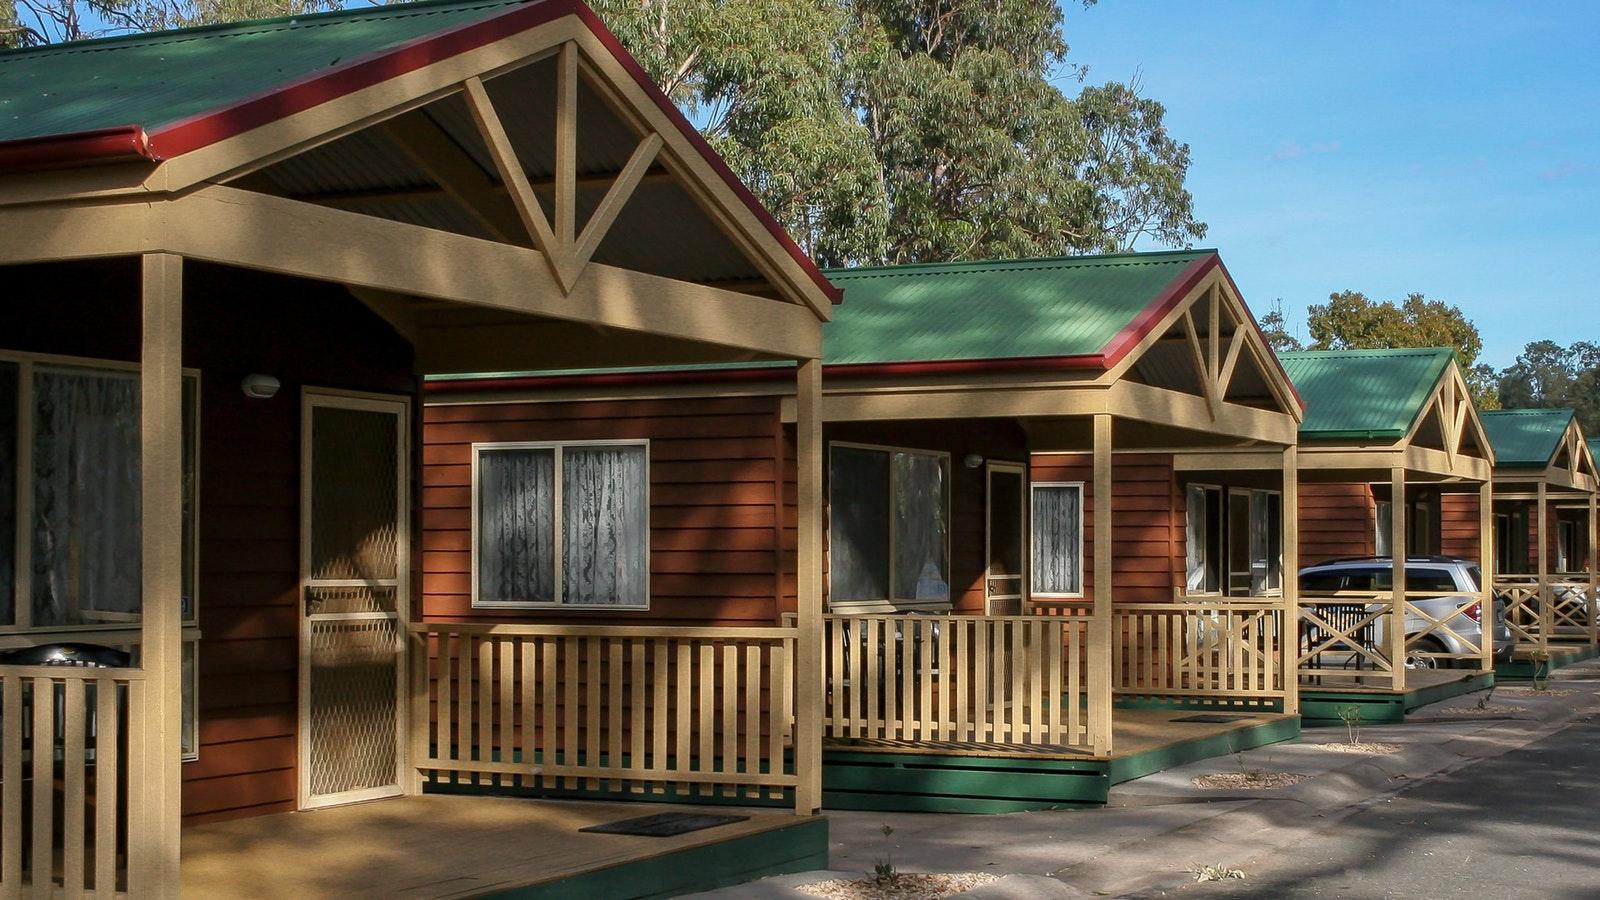 Grampians View cabins